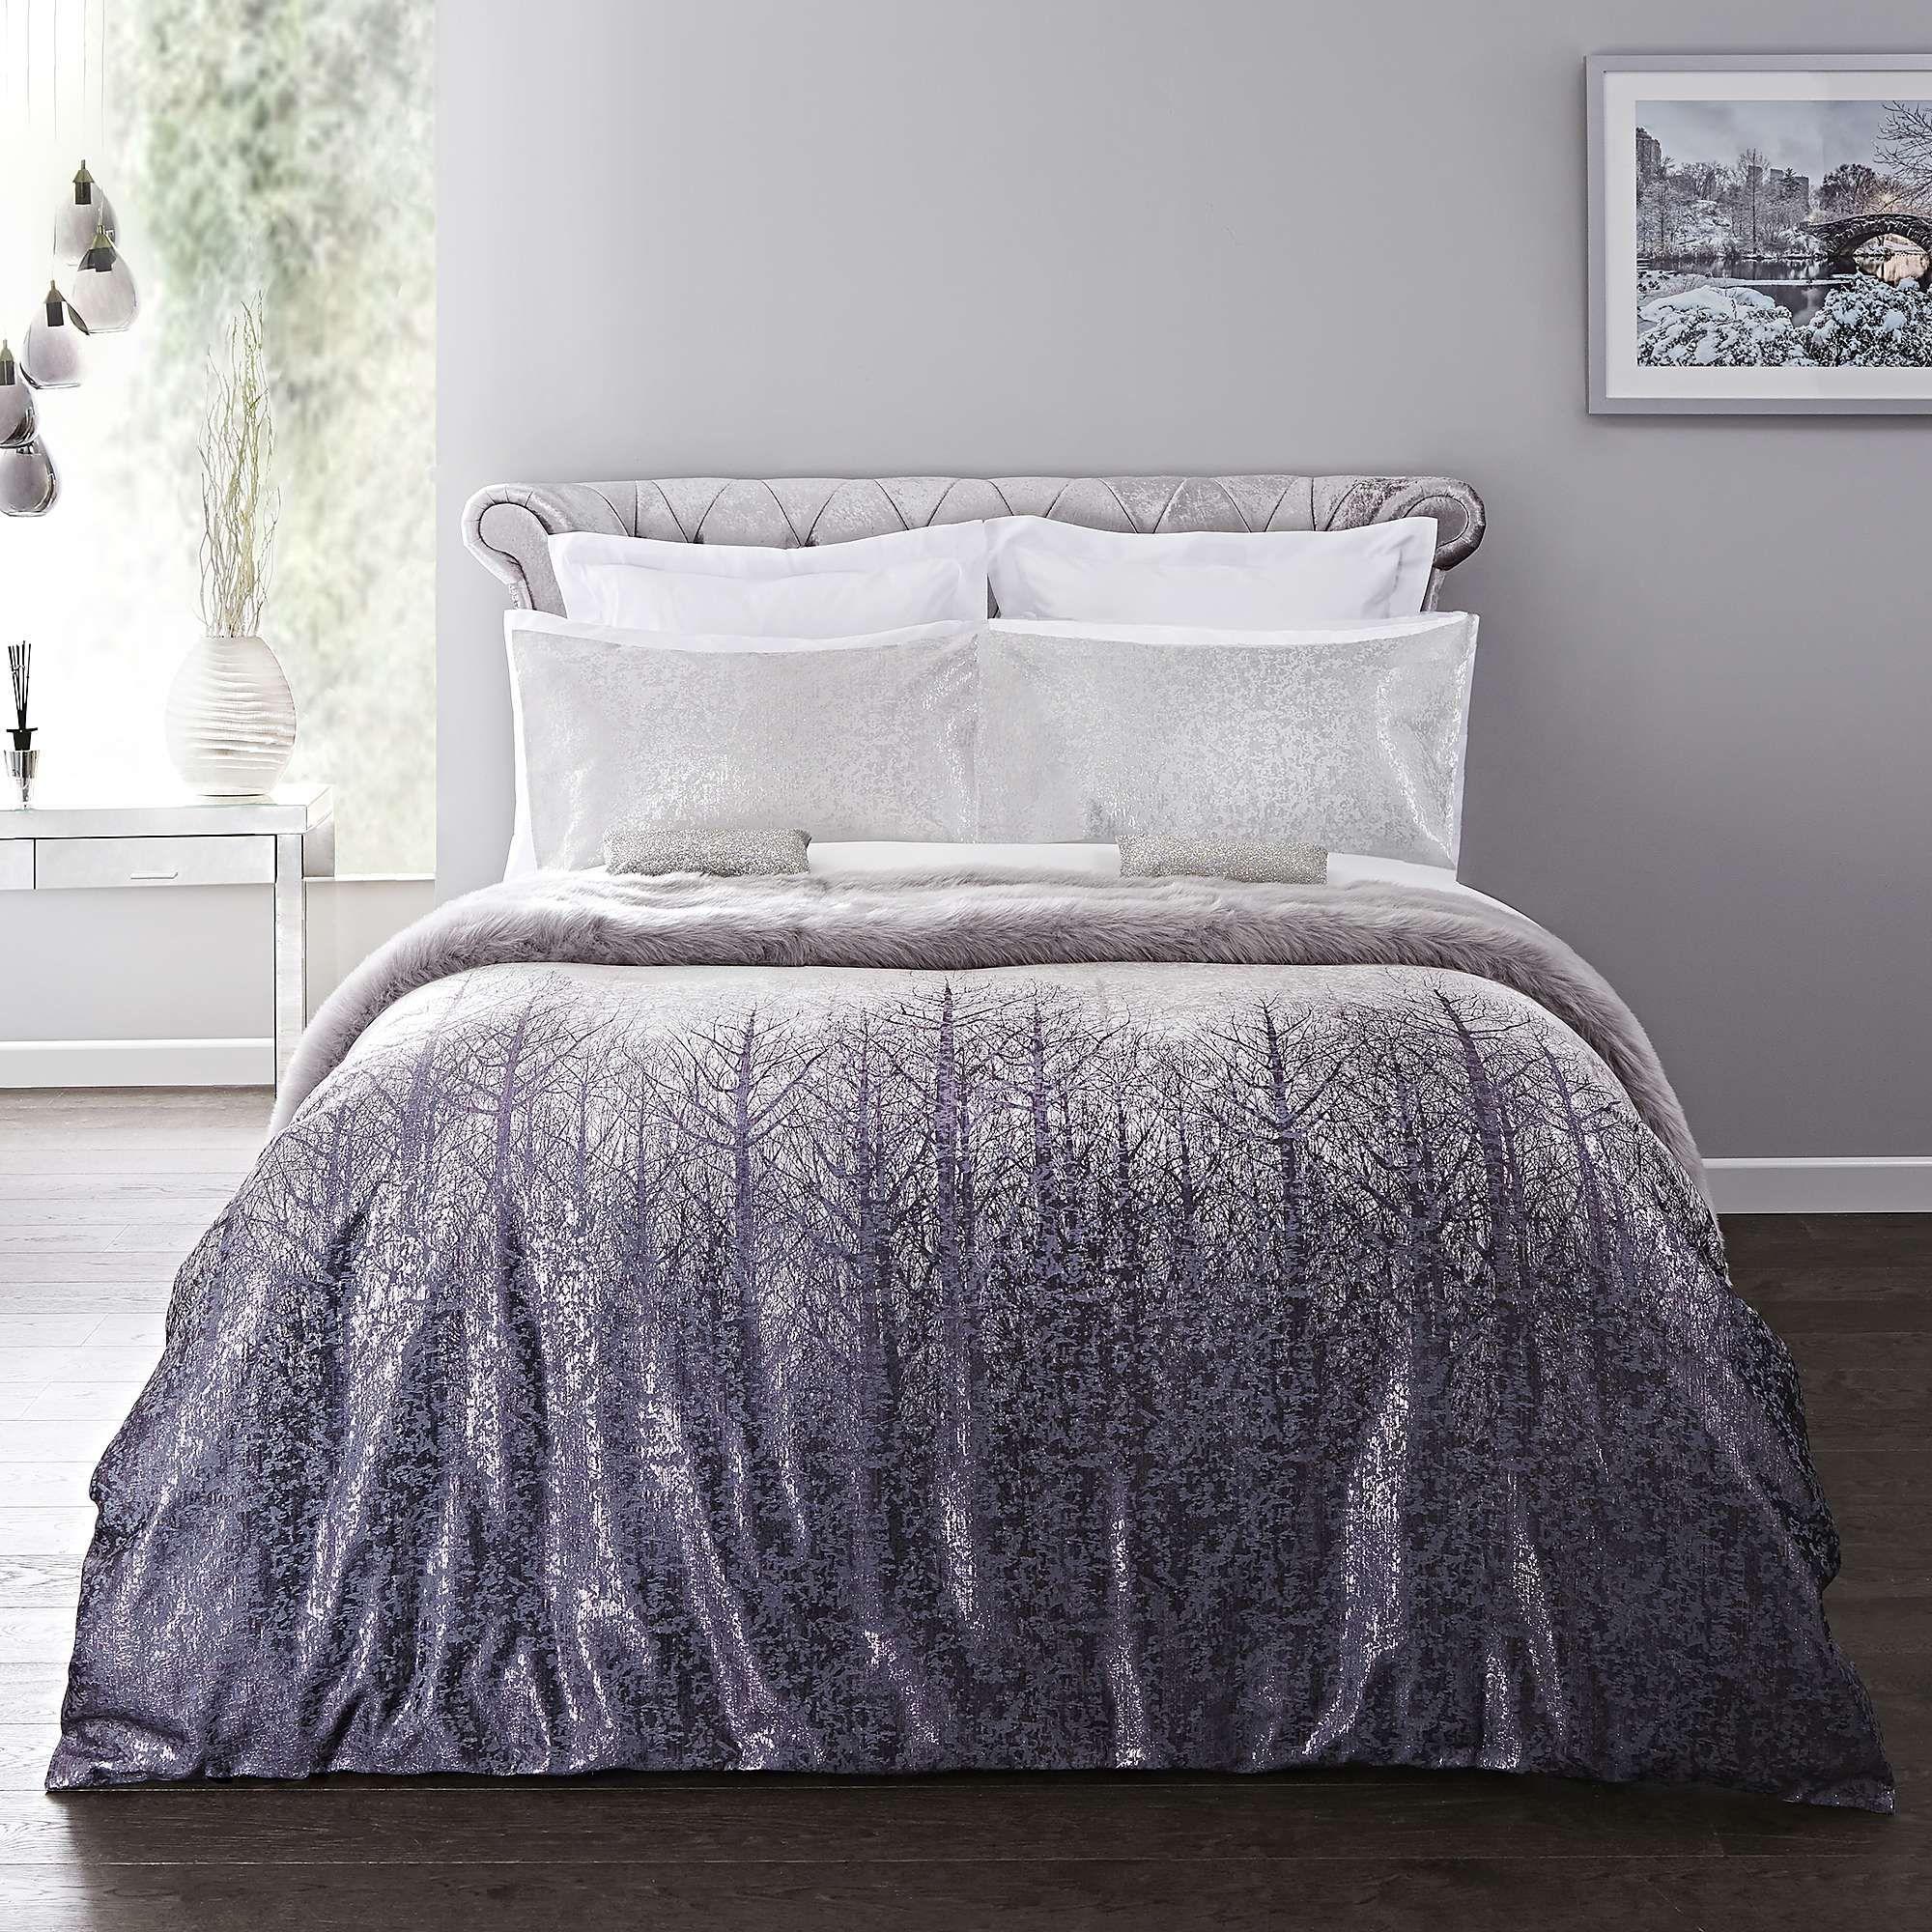 Ontario Duvet Cover and Pillowcase Set